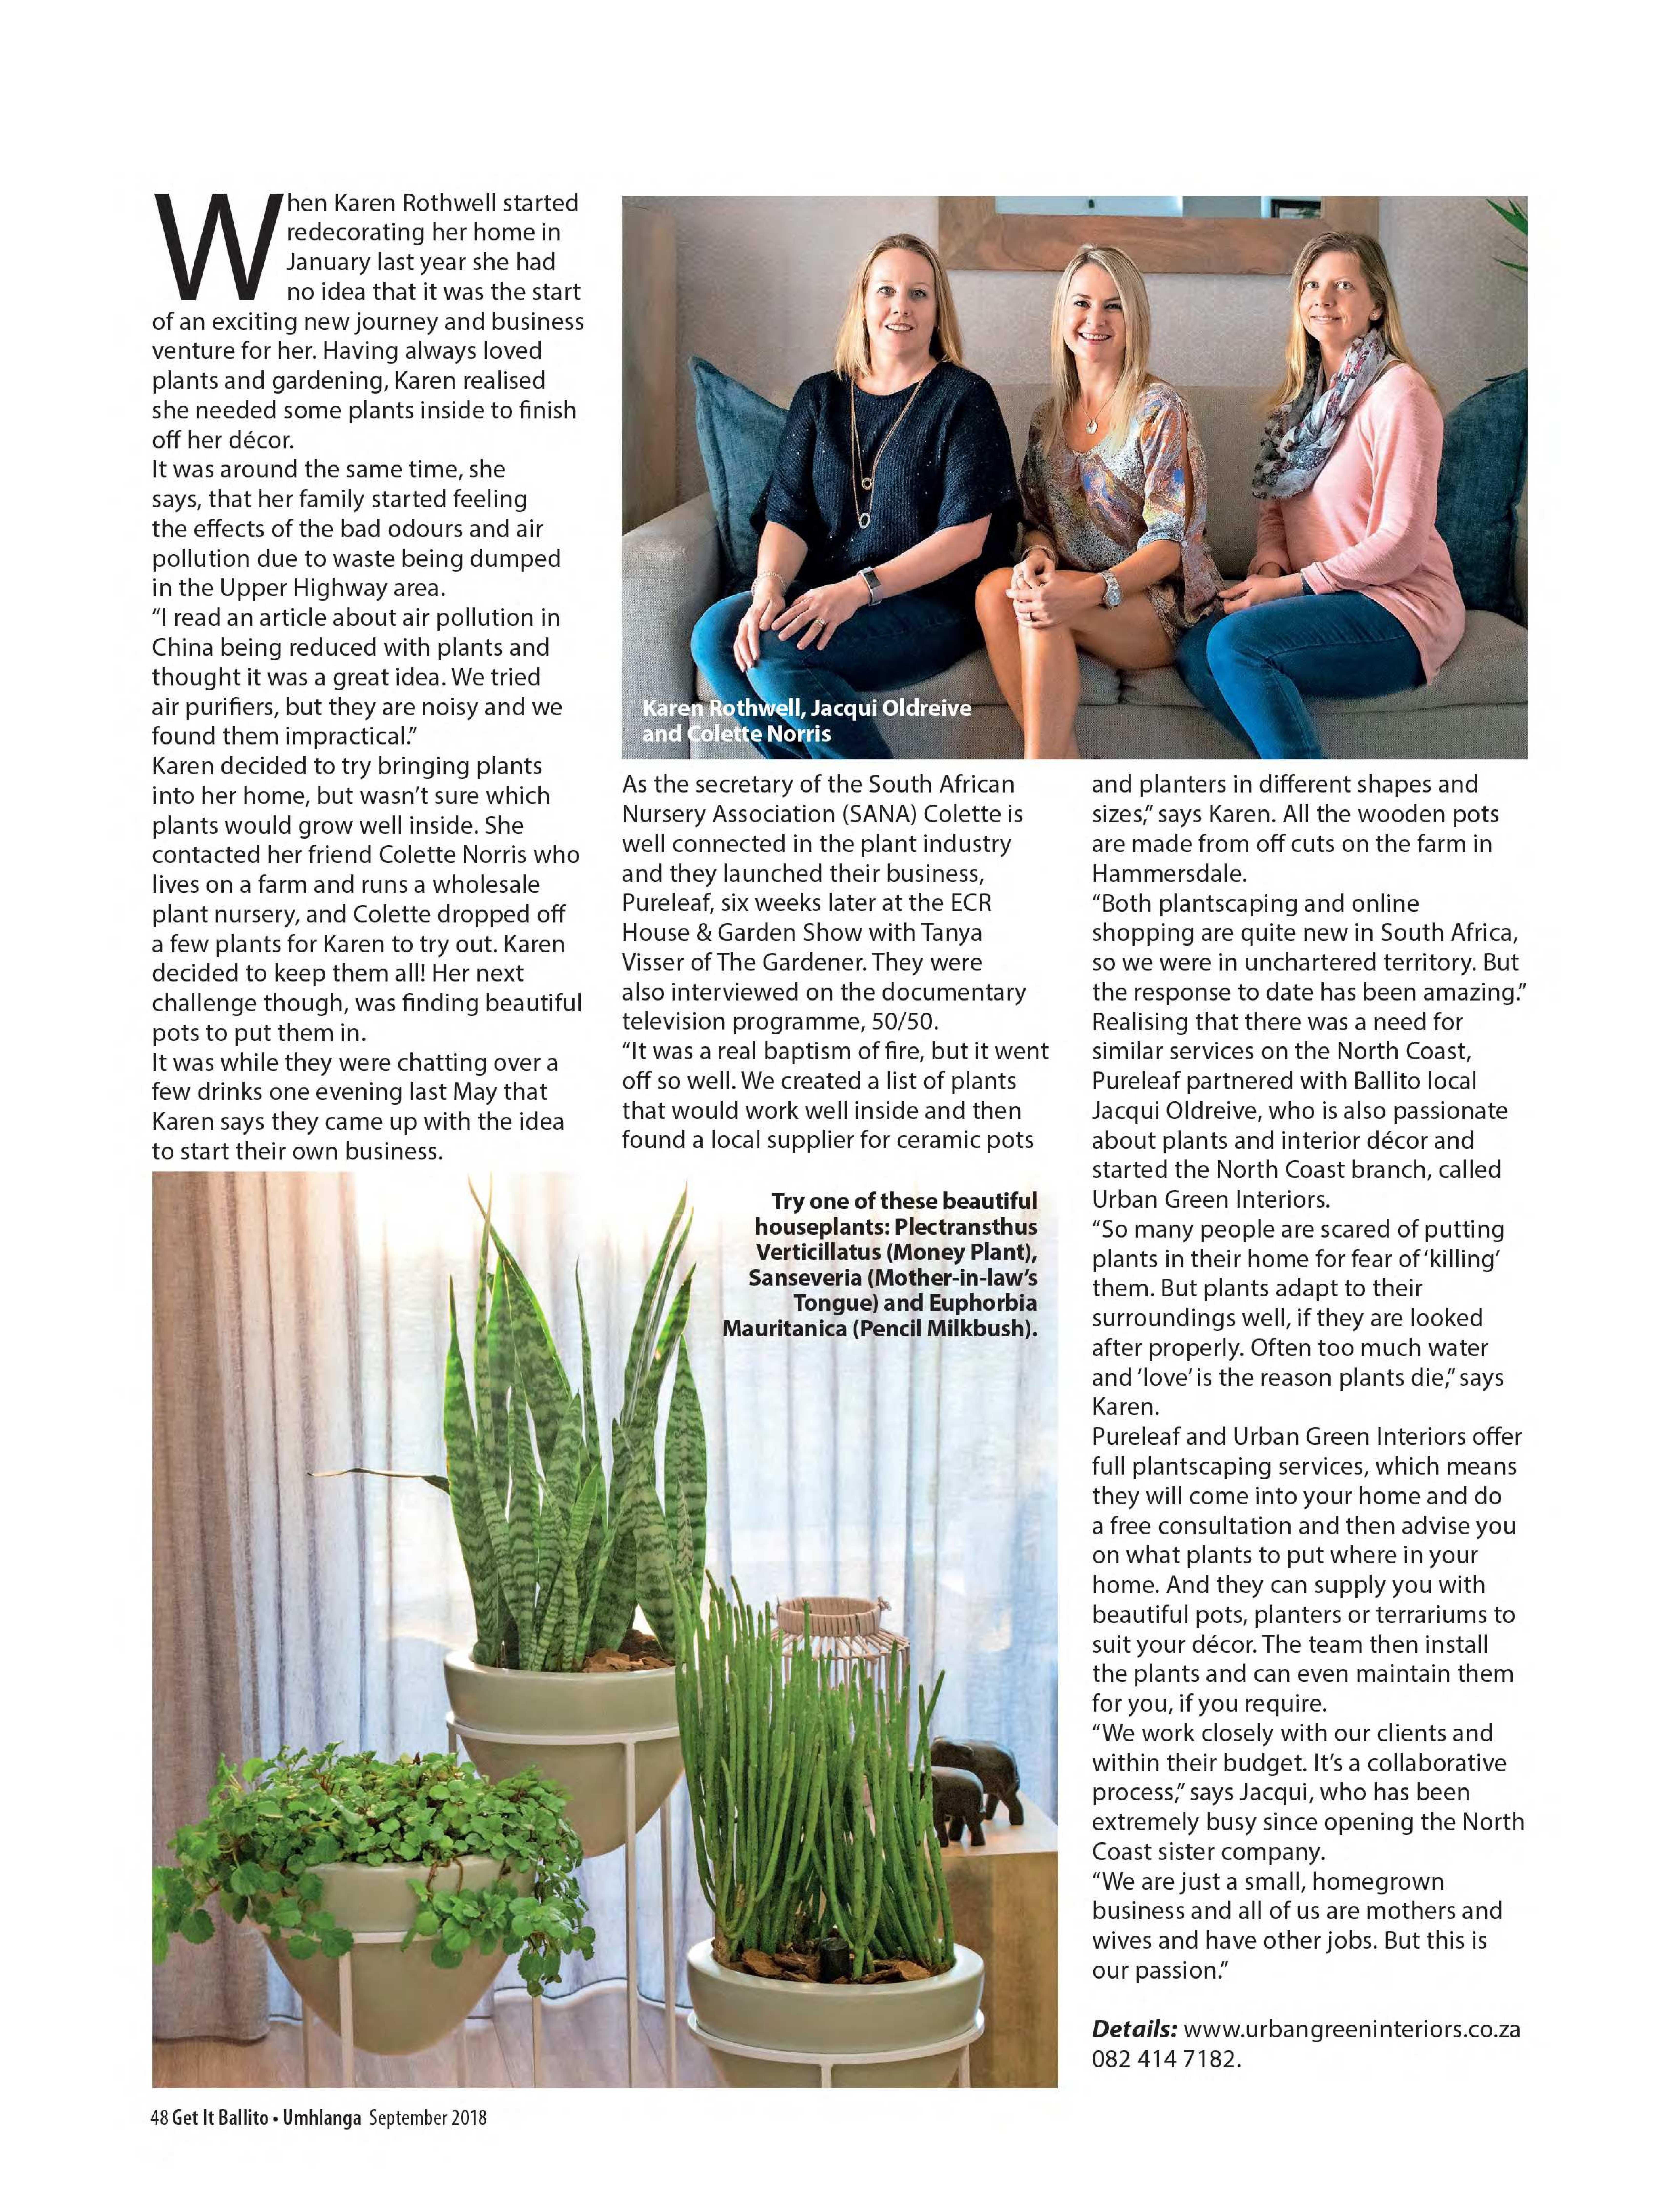 get-magazine-ballitoumhlanga-september-2018-epapers-page-50